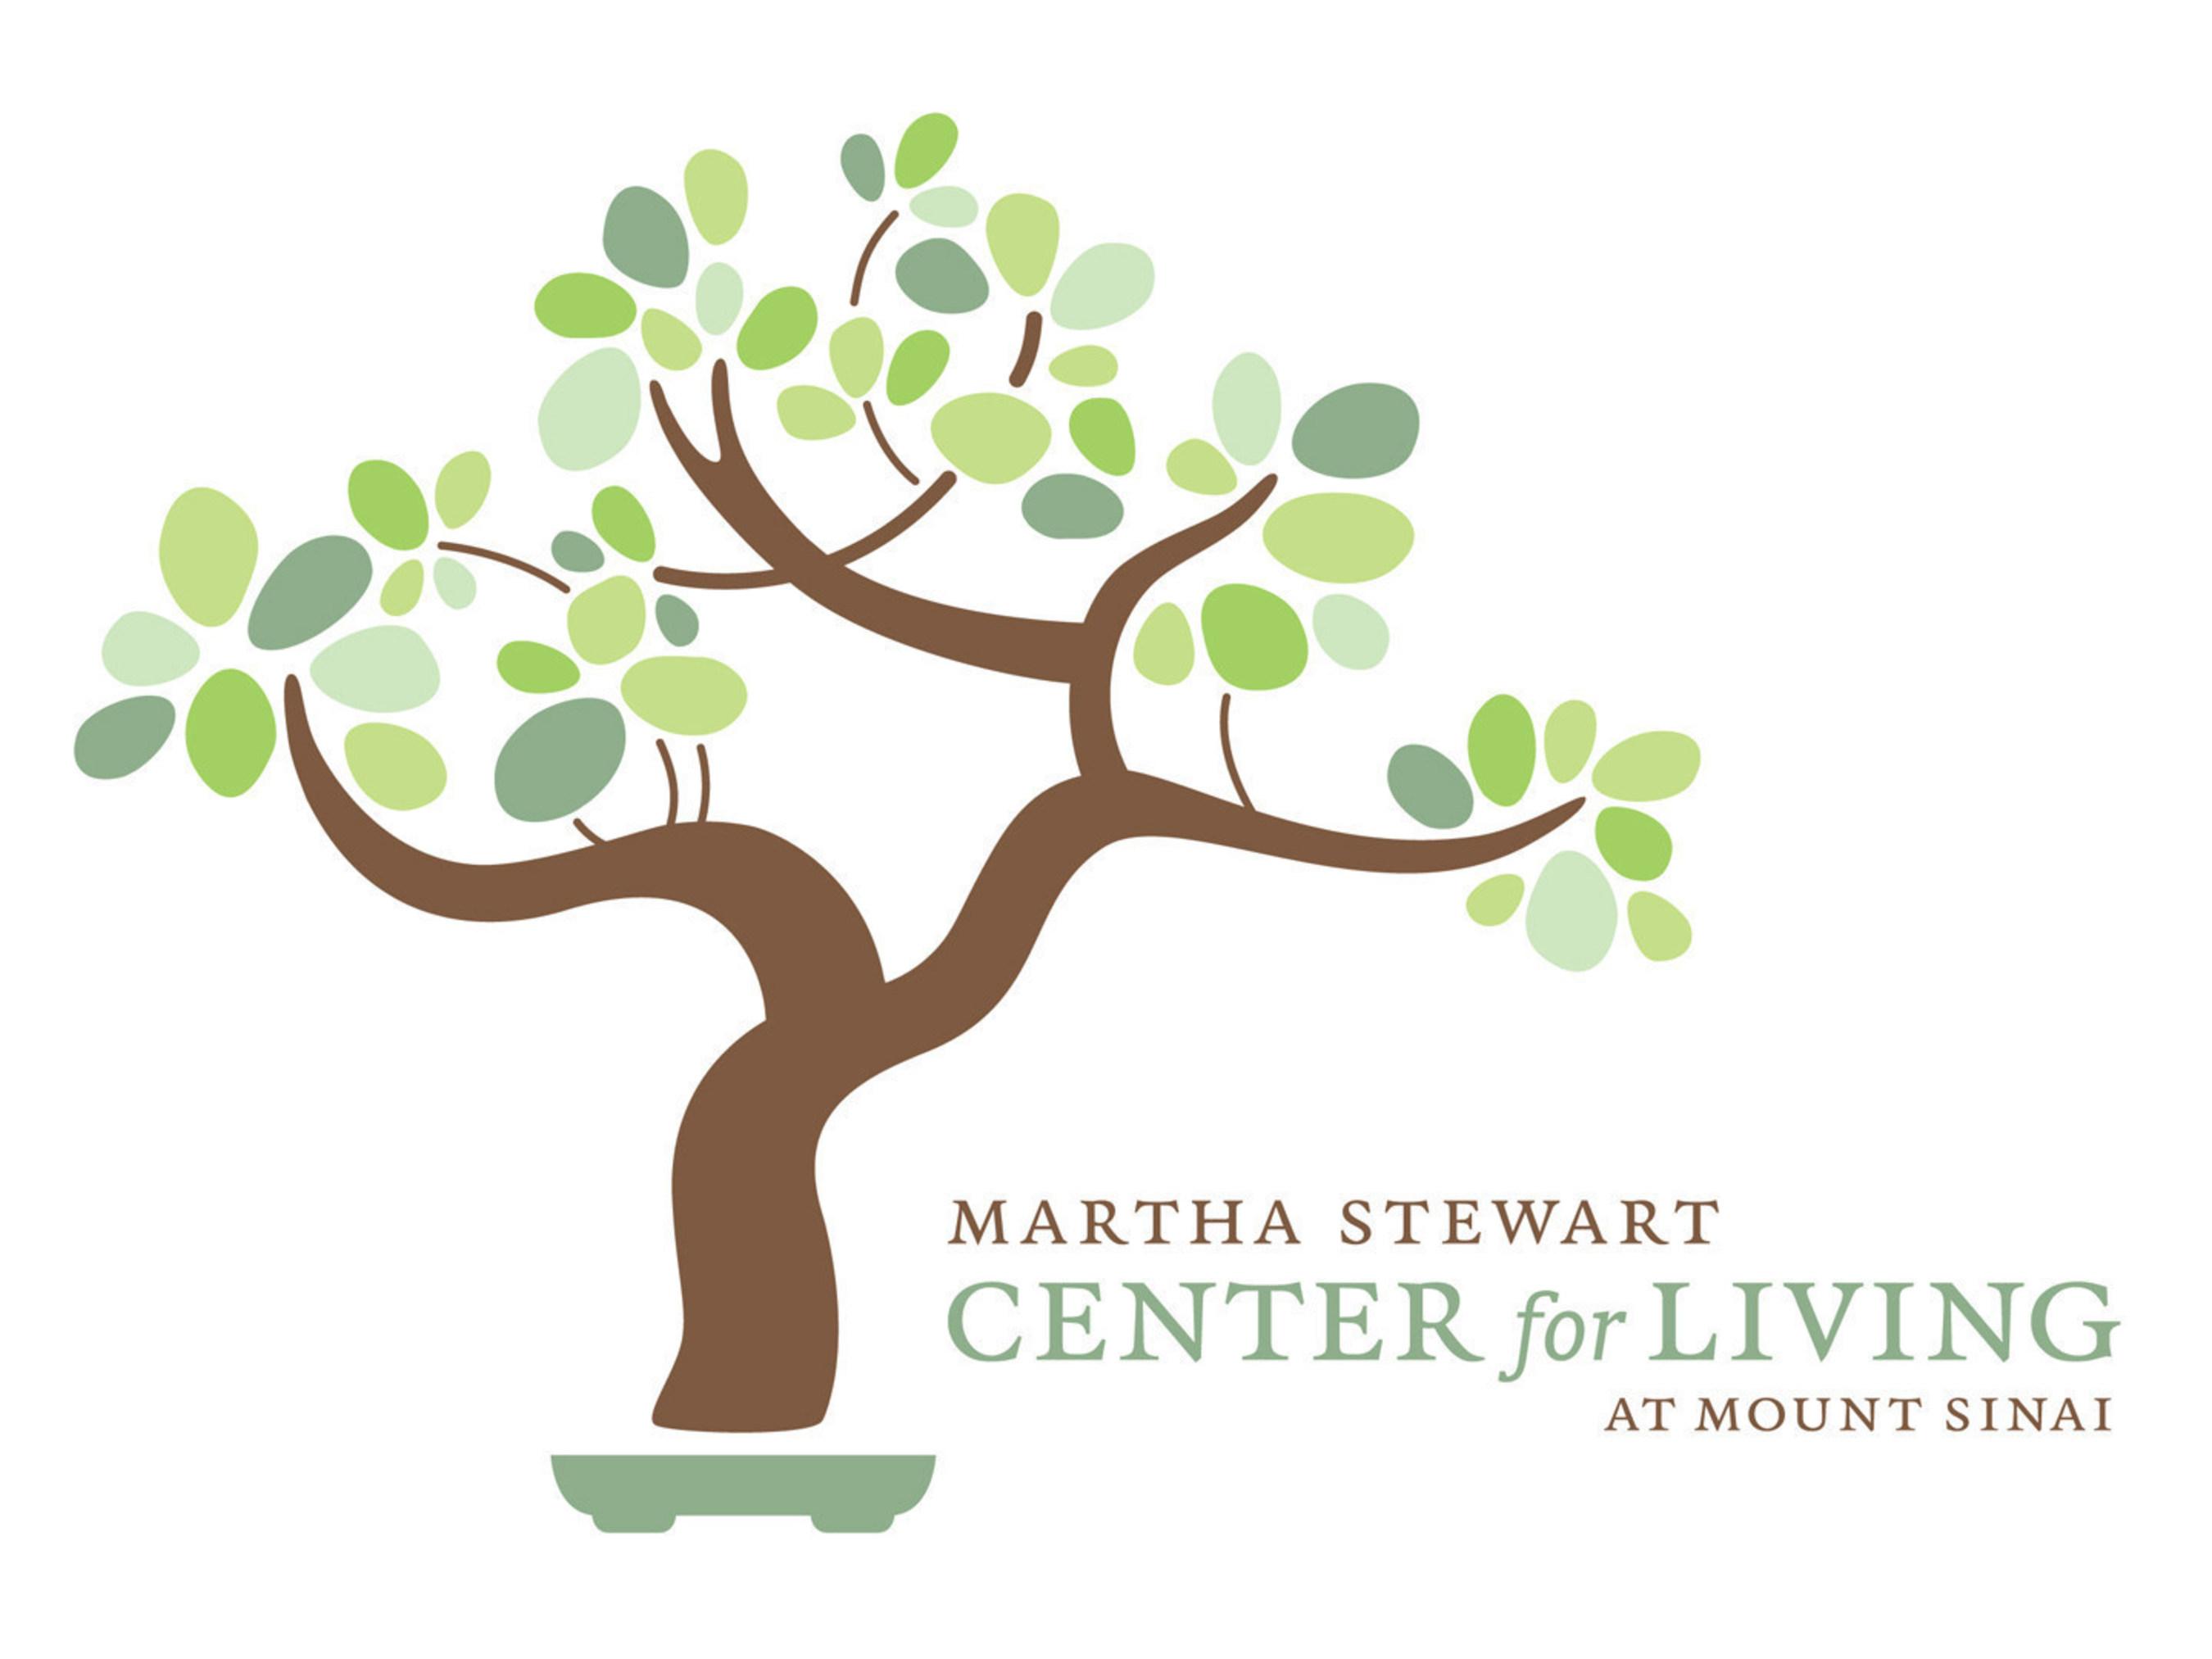 Martha Stewart Announces Center For Living At Mount Sinai Gala